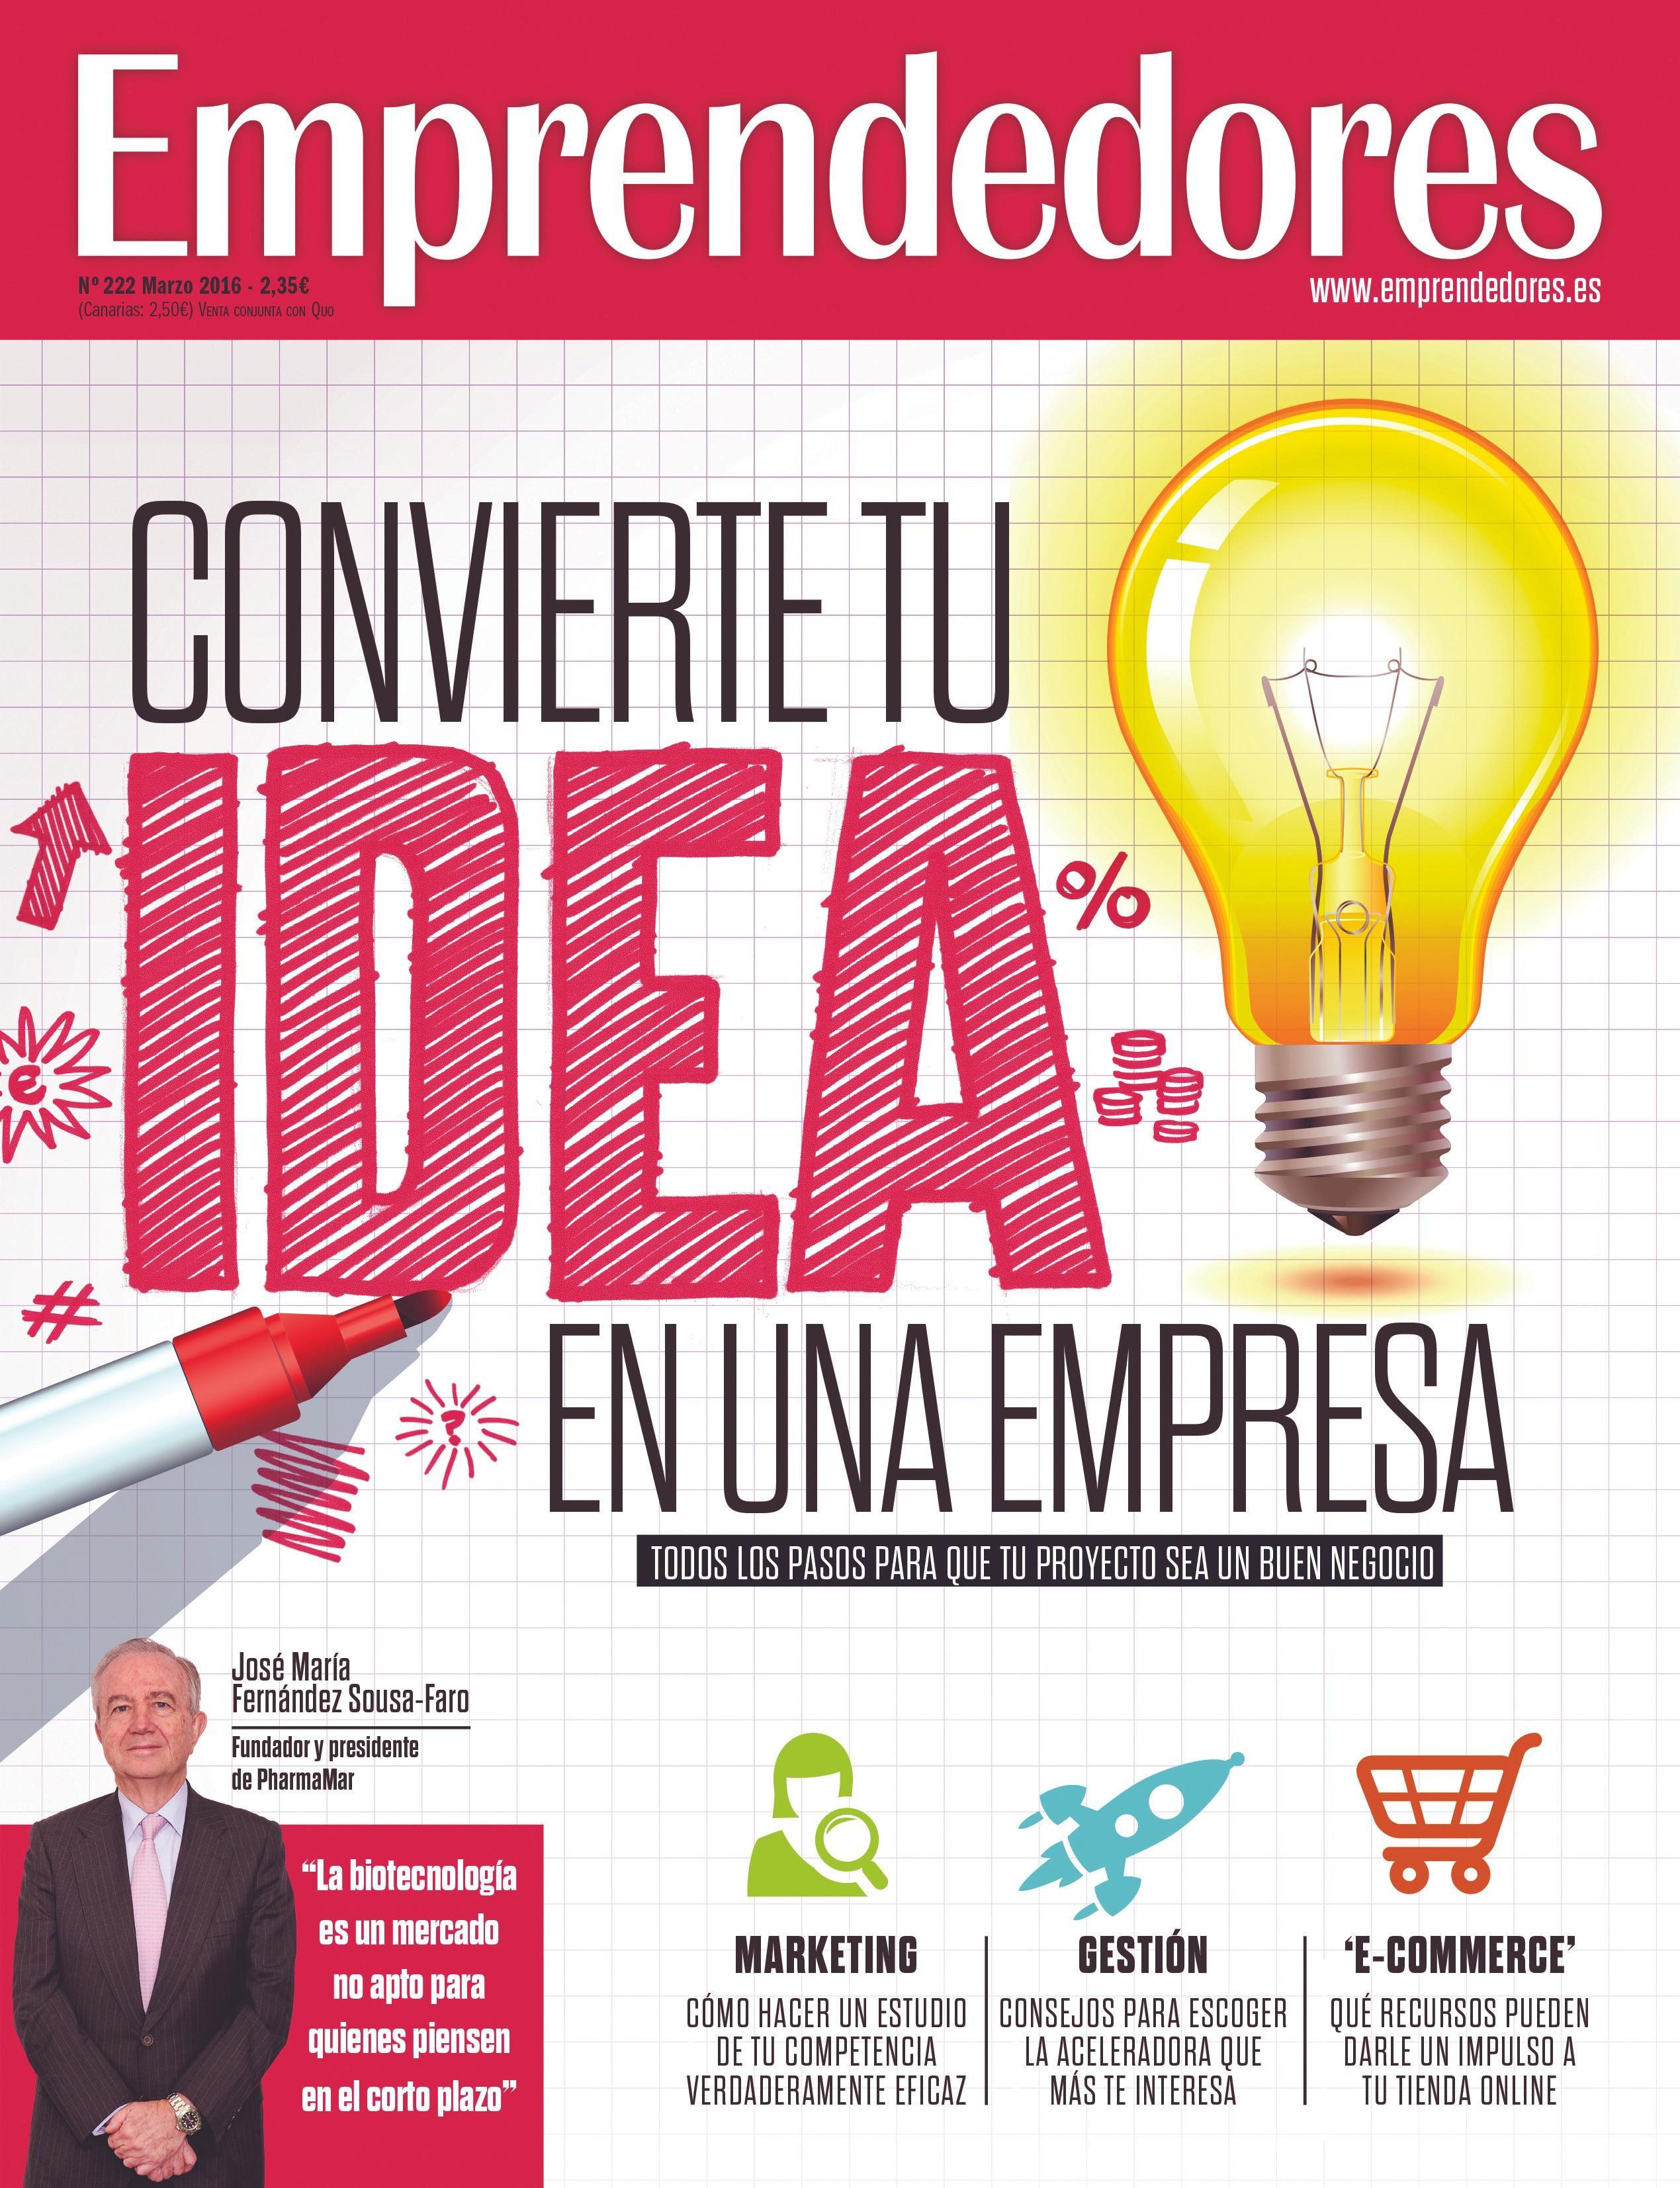 Portada de la revista Emprendedores, 2016.